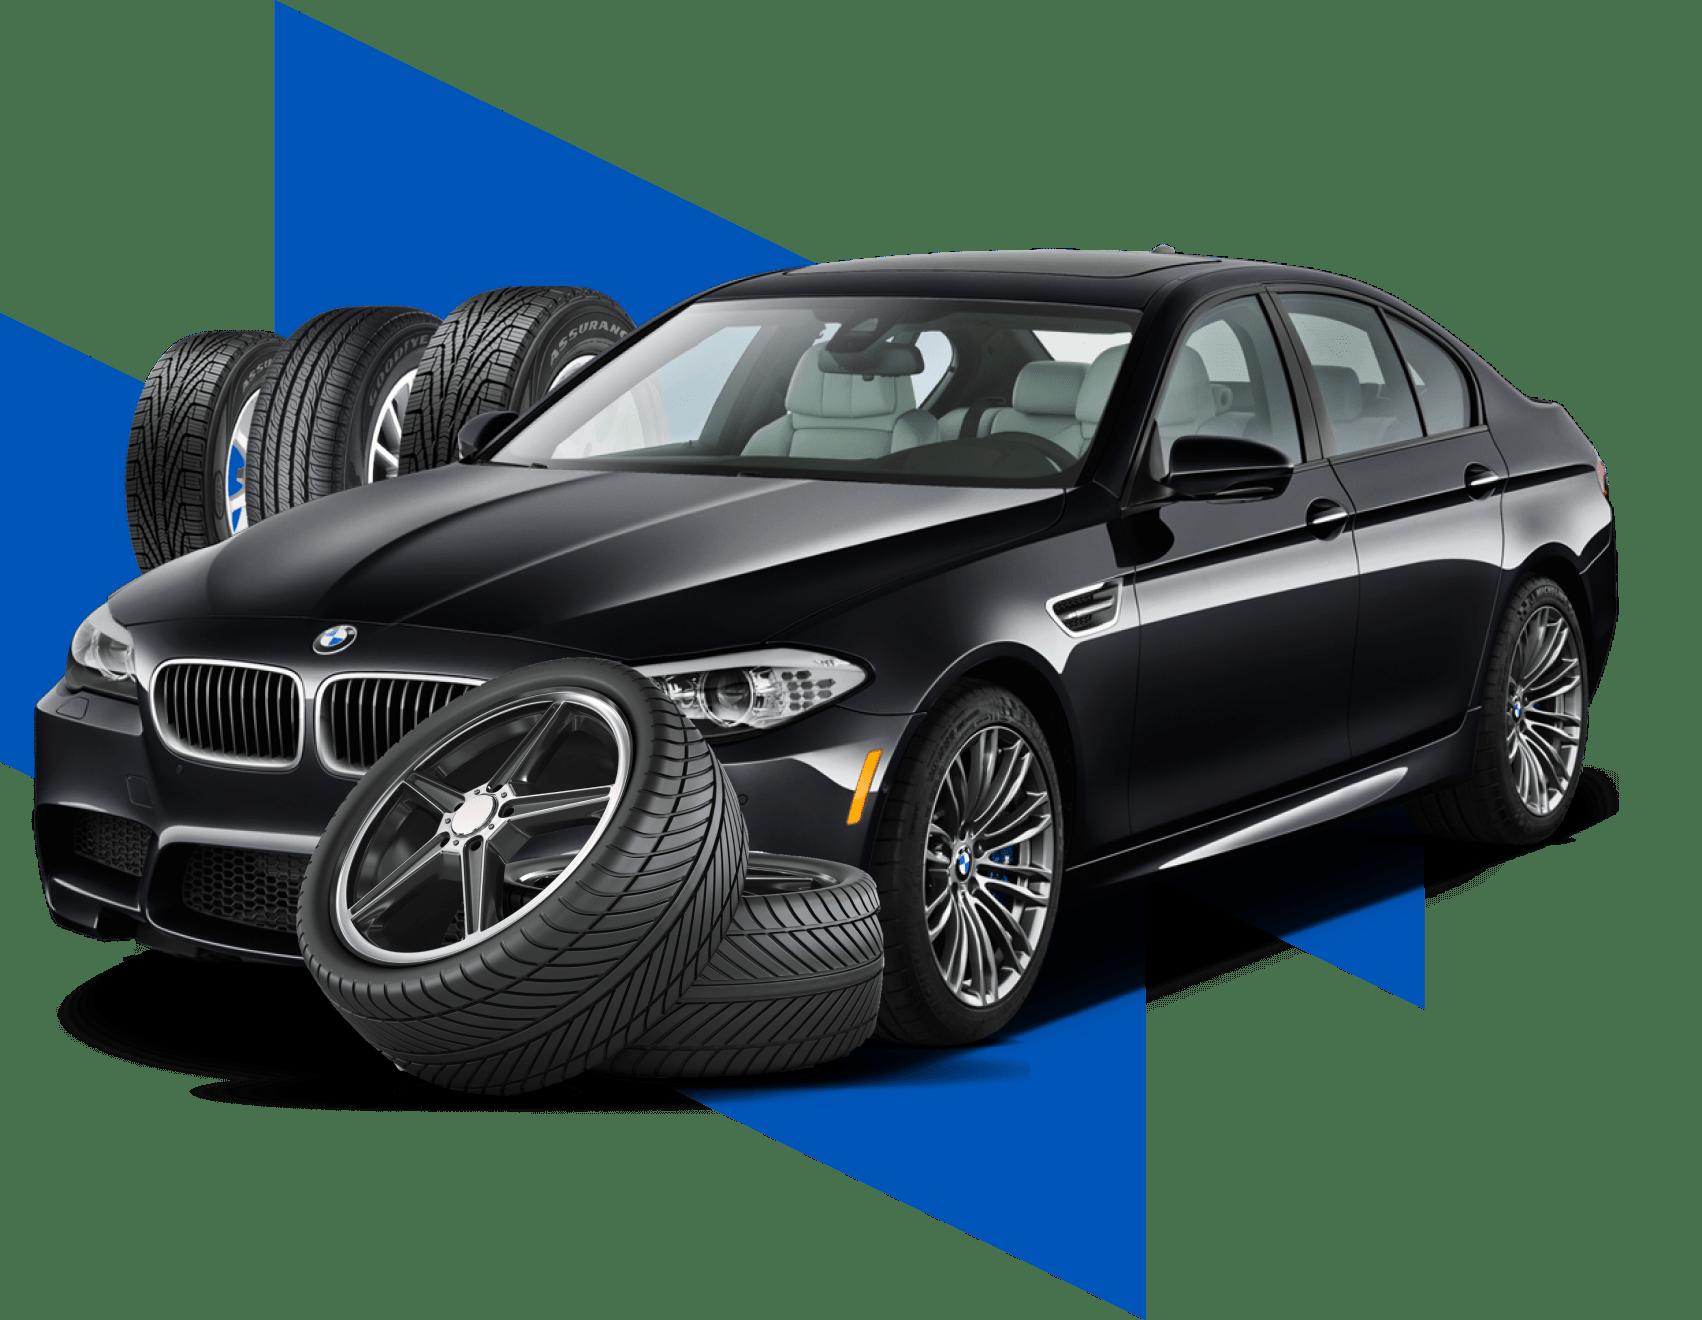 Turning Tires Mobile Tire Exchange Ltd.